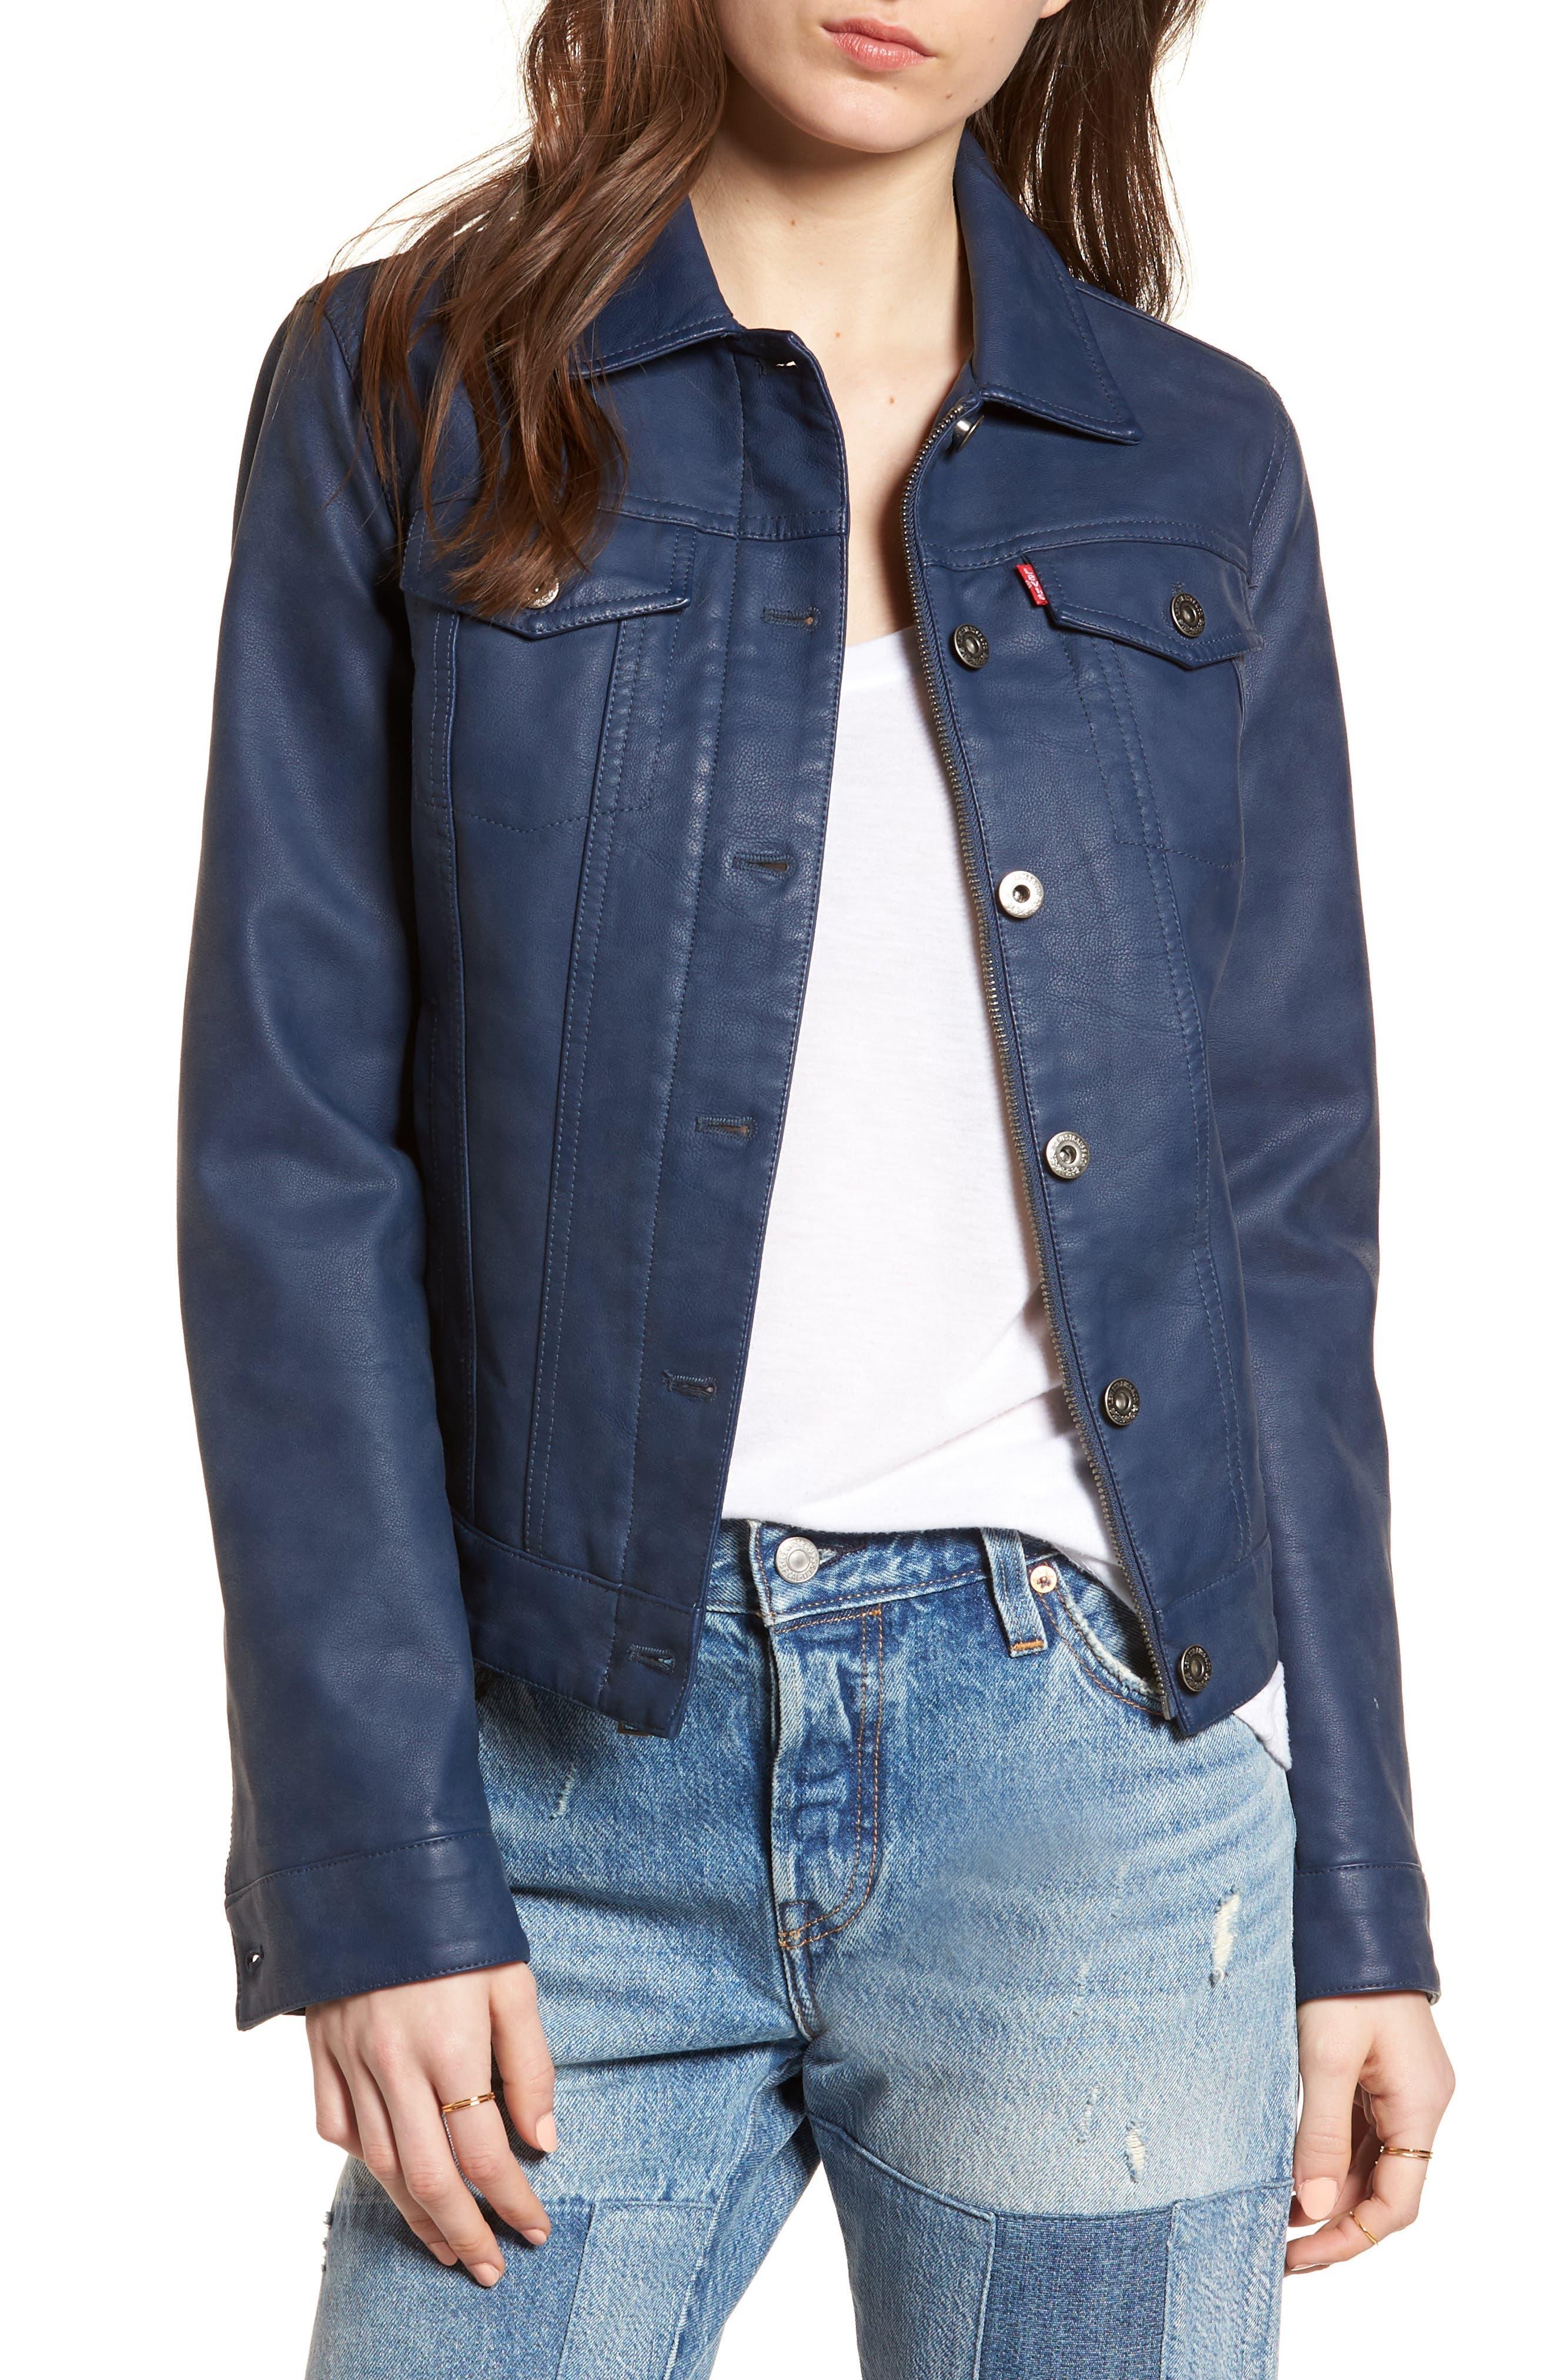 Alternate Image 1 Selected - Levi's® Faux Leather Trucker Jacket